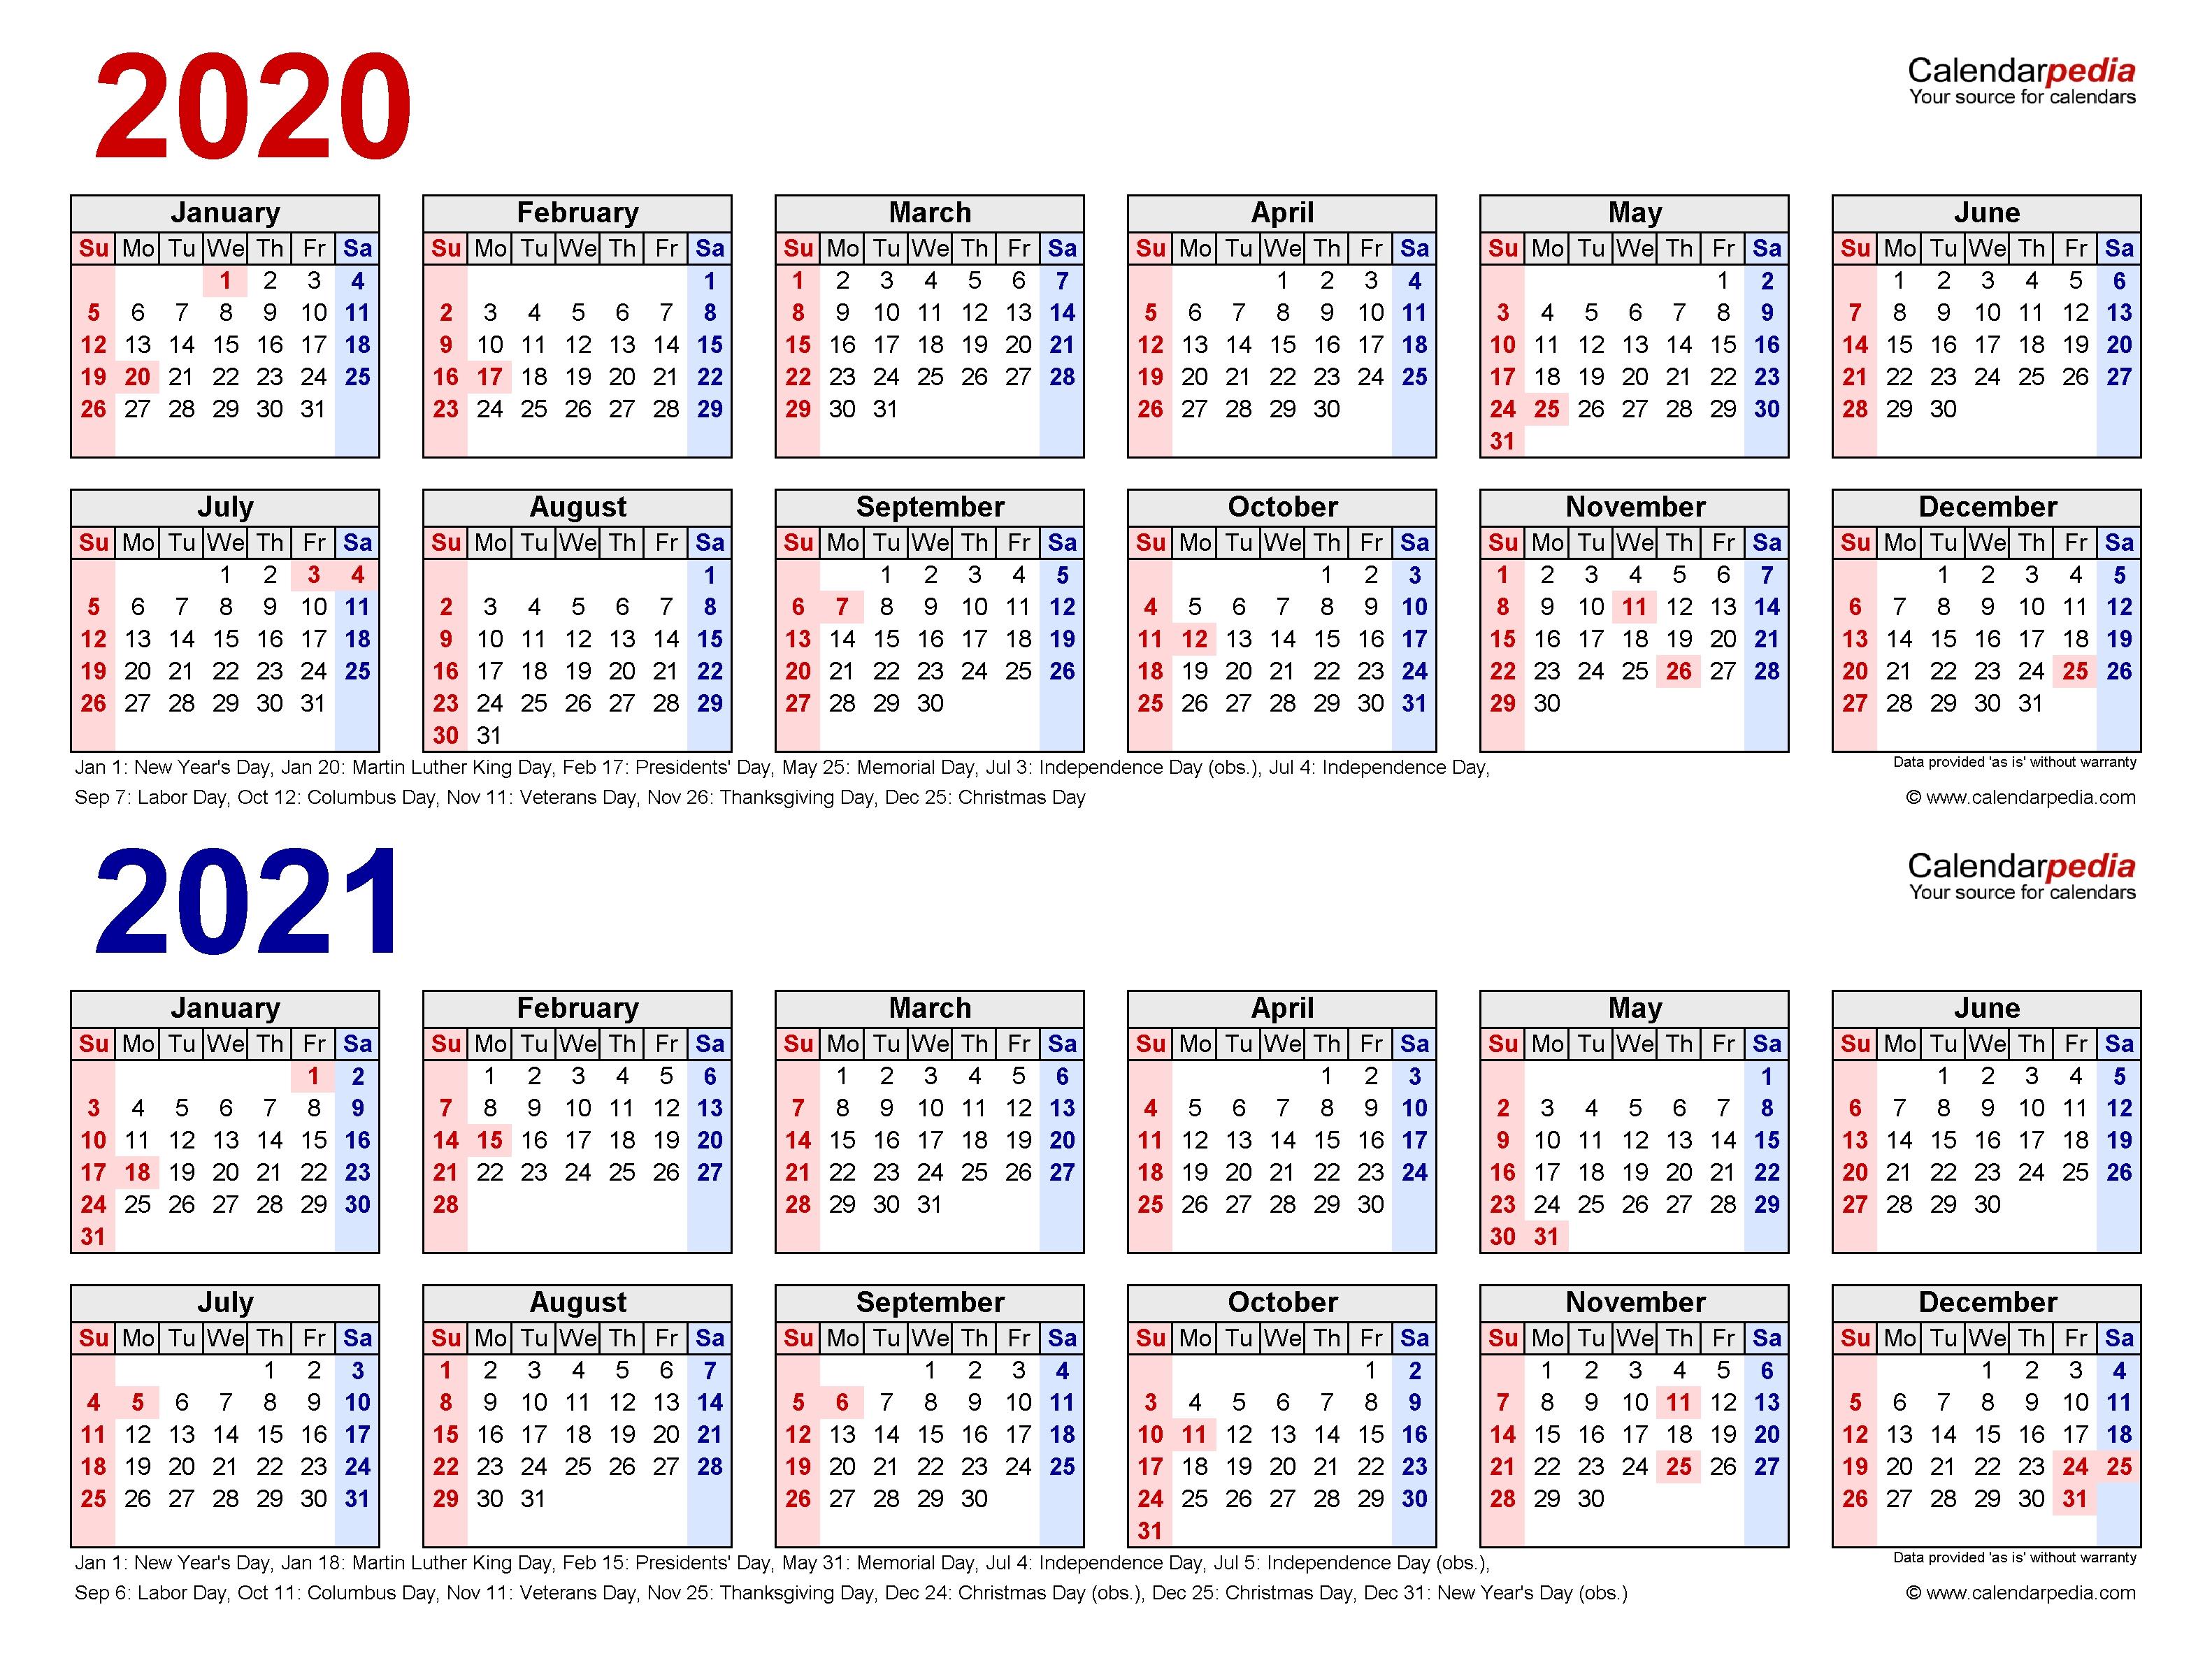 2020-2021 Two Year Calendar - Free Printable Microsoft Word  Printable 12 Month 2020 2021 Calendar